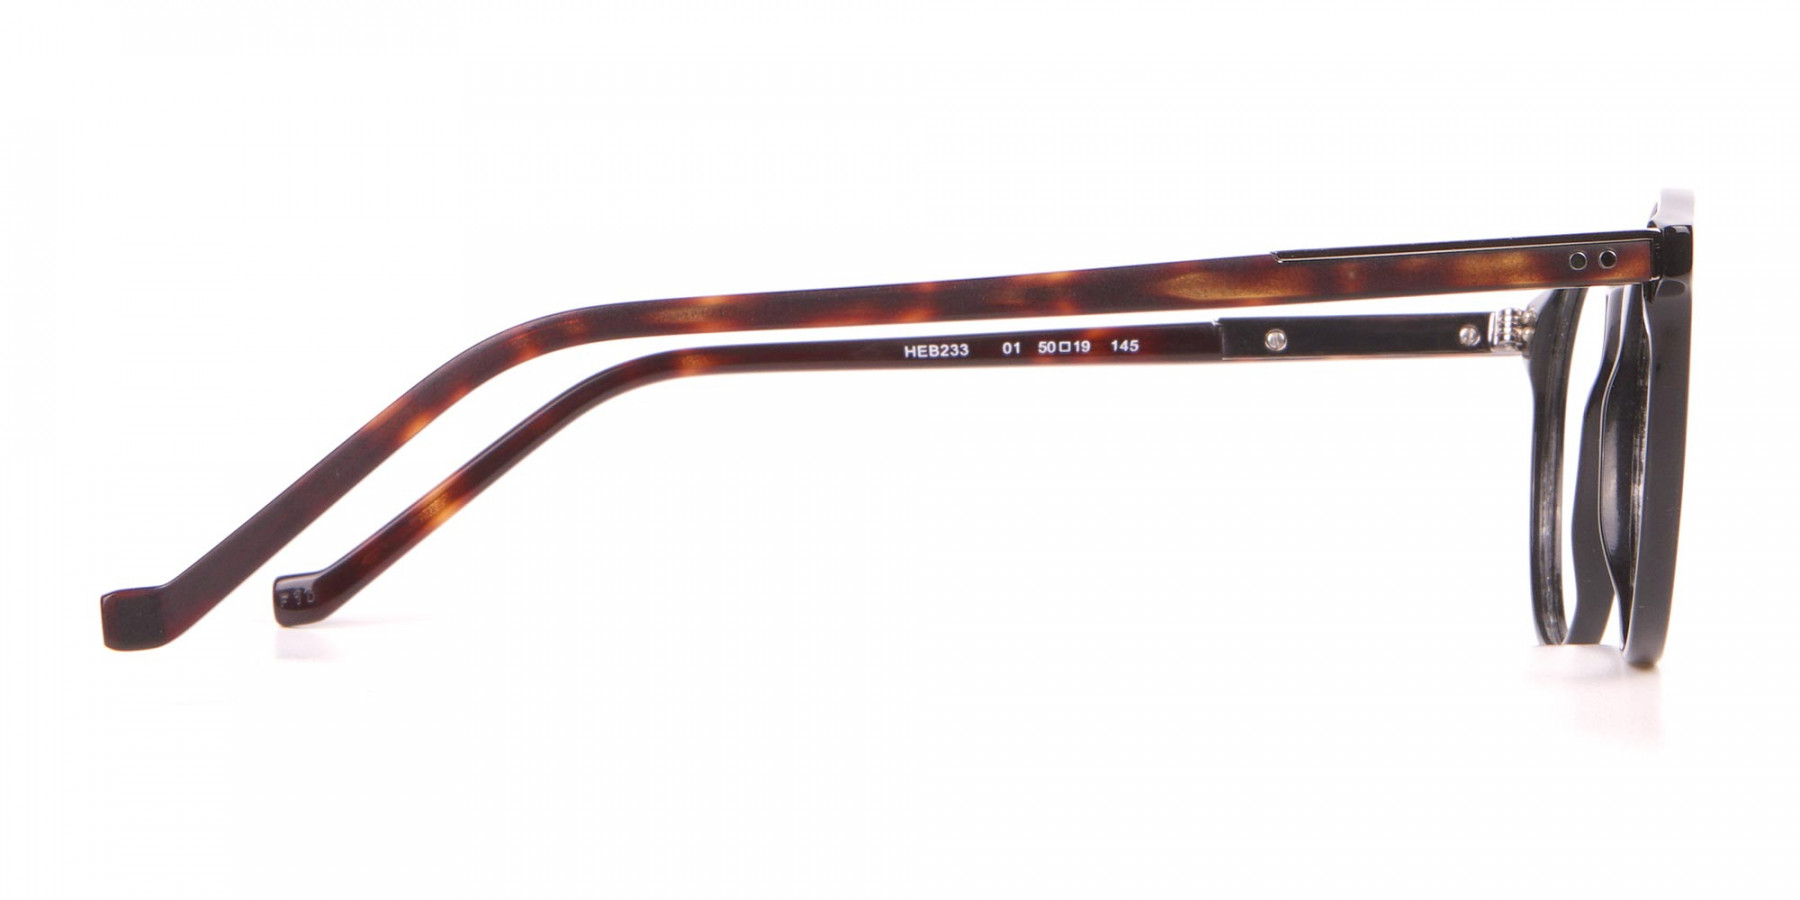 HACKETT HEB233 Bespoke Retro Round Frame Black & Tortoise-1